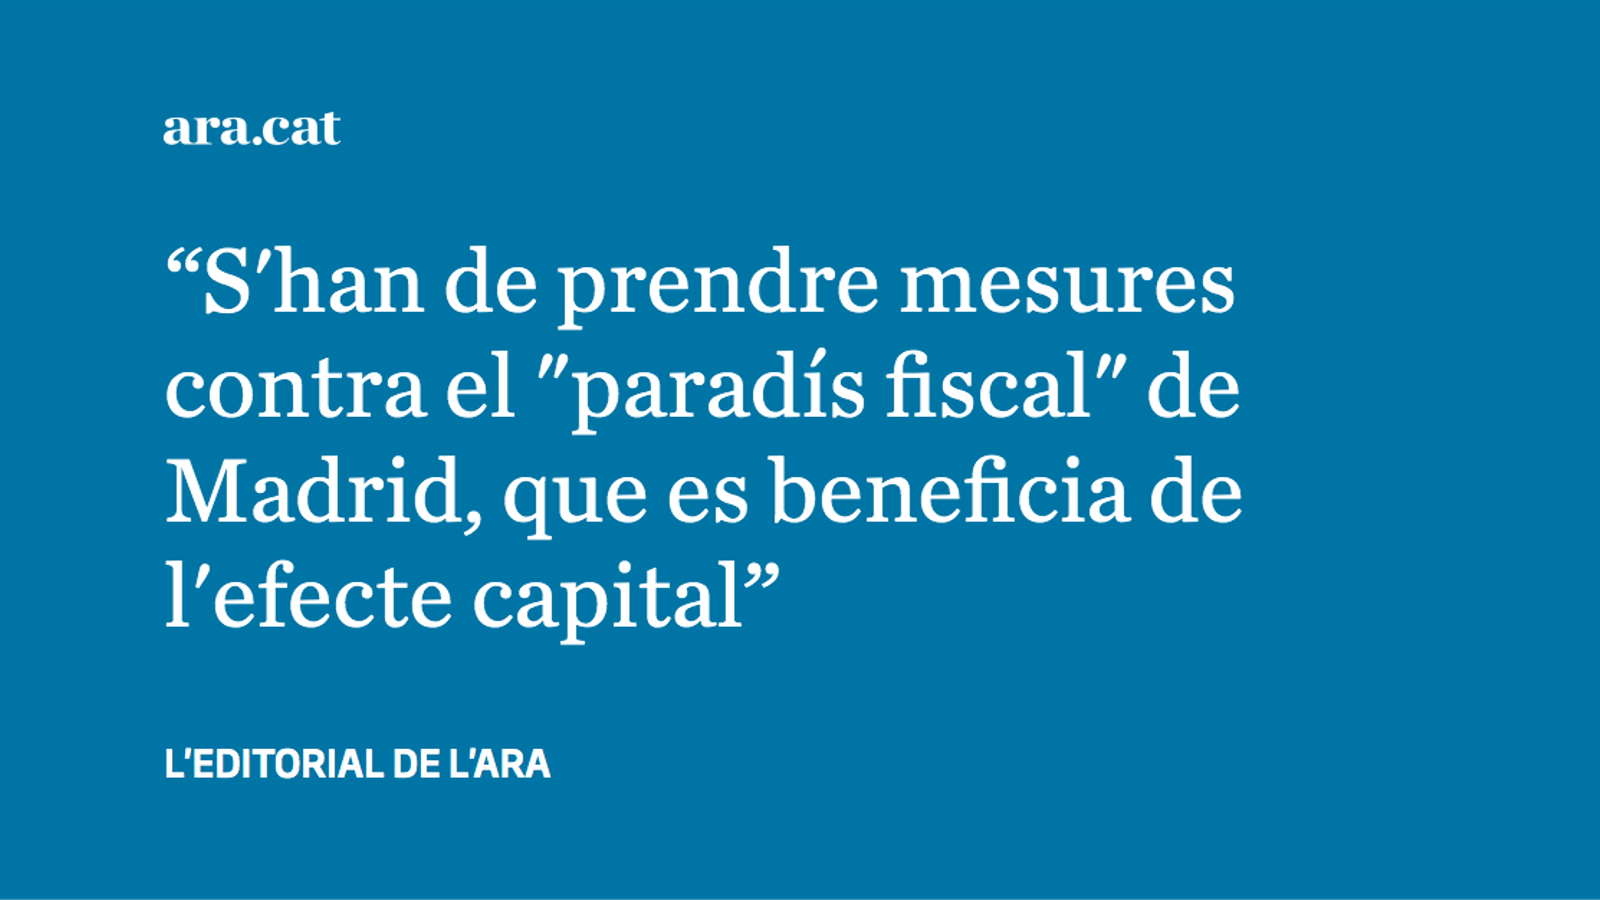 Pressupostos i dúmping fiscal